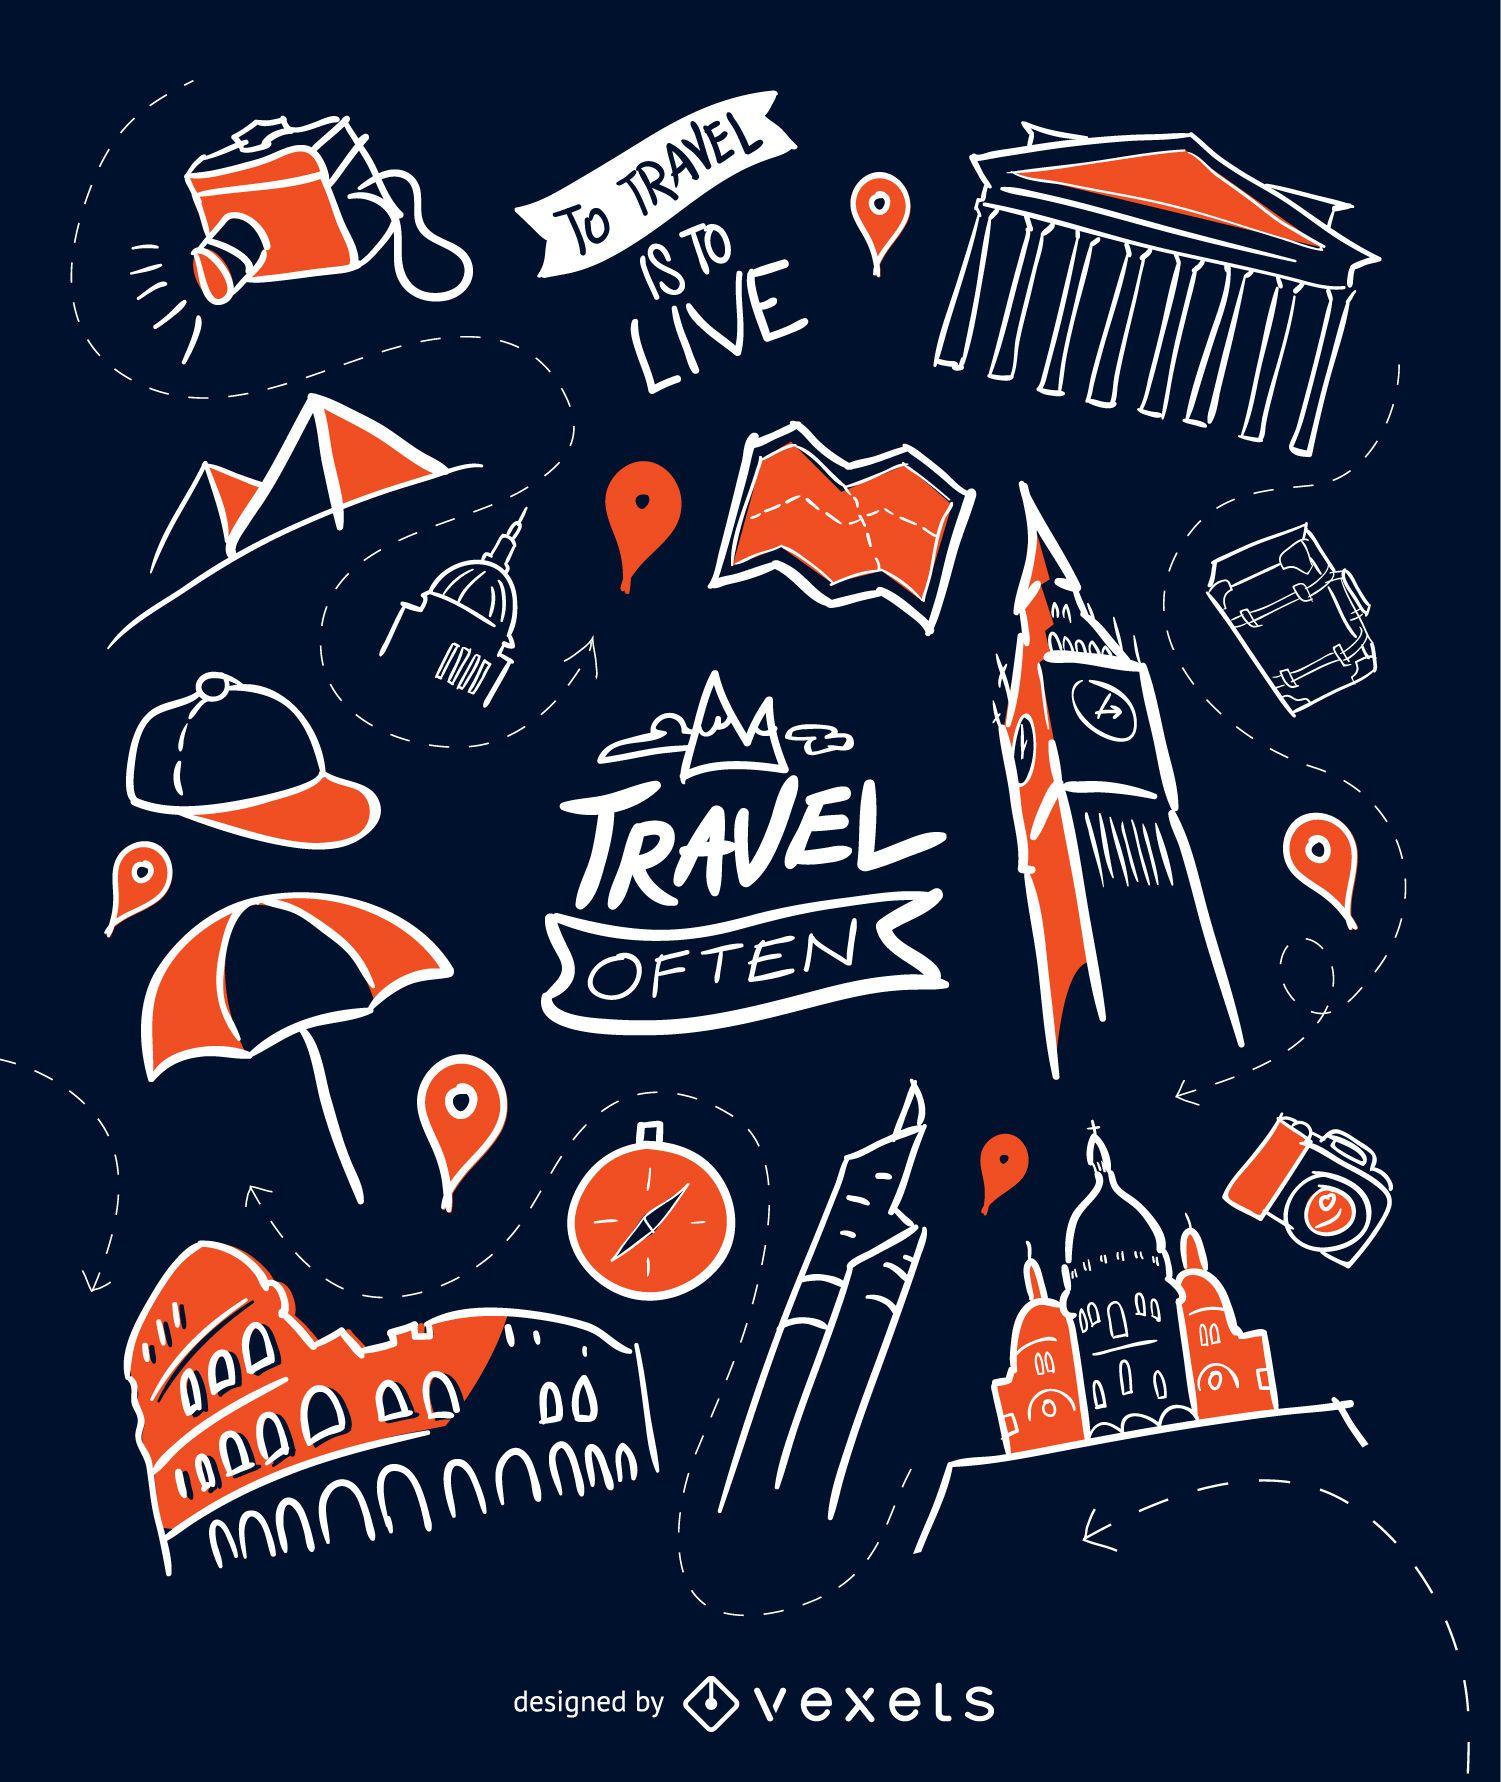 Hand-drawn travel wallpaper